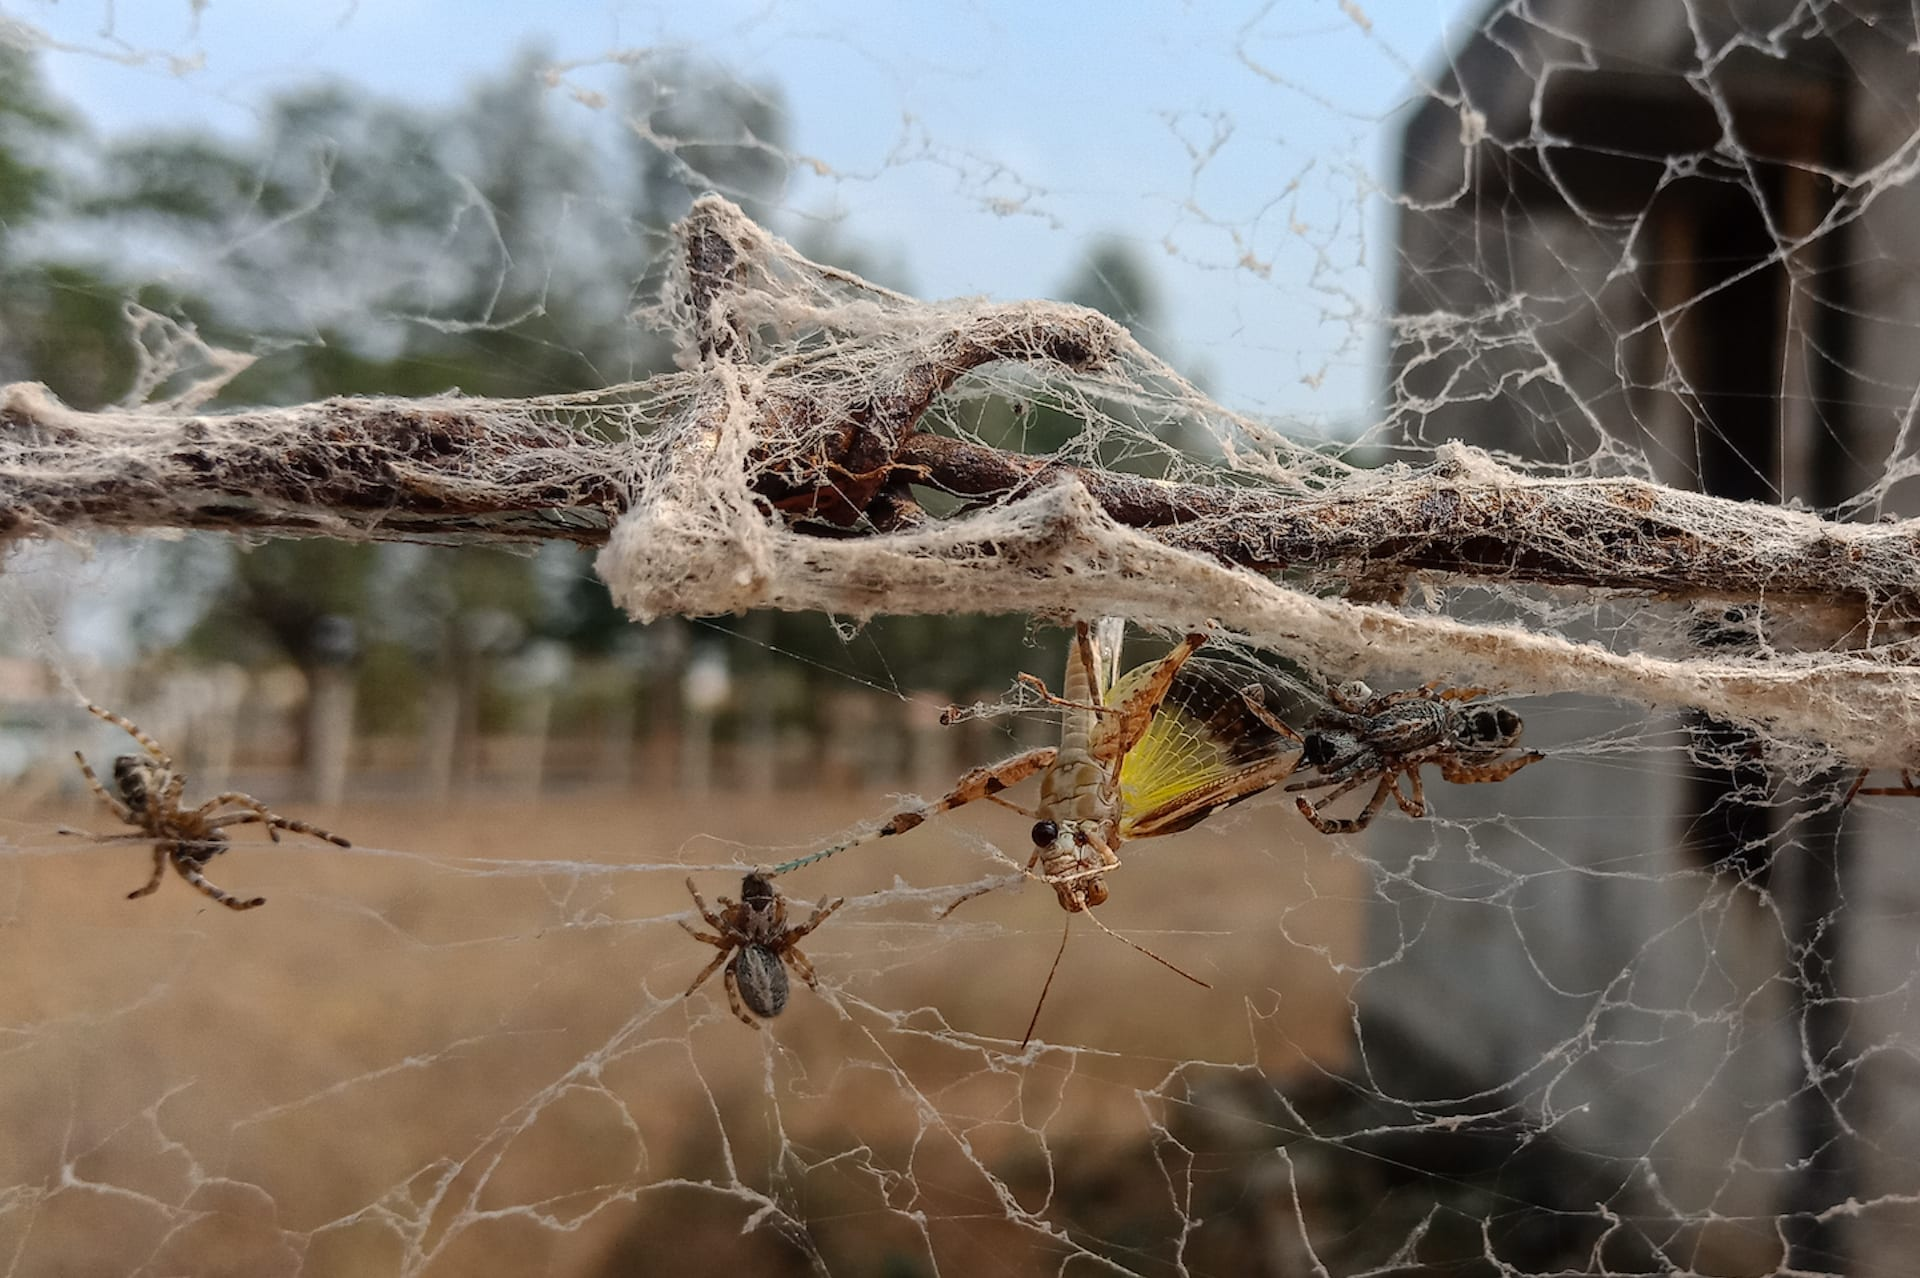 Female social spider S sarasinorum feeding on live grasshopper